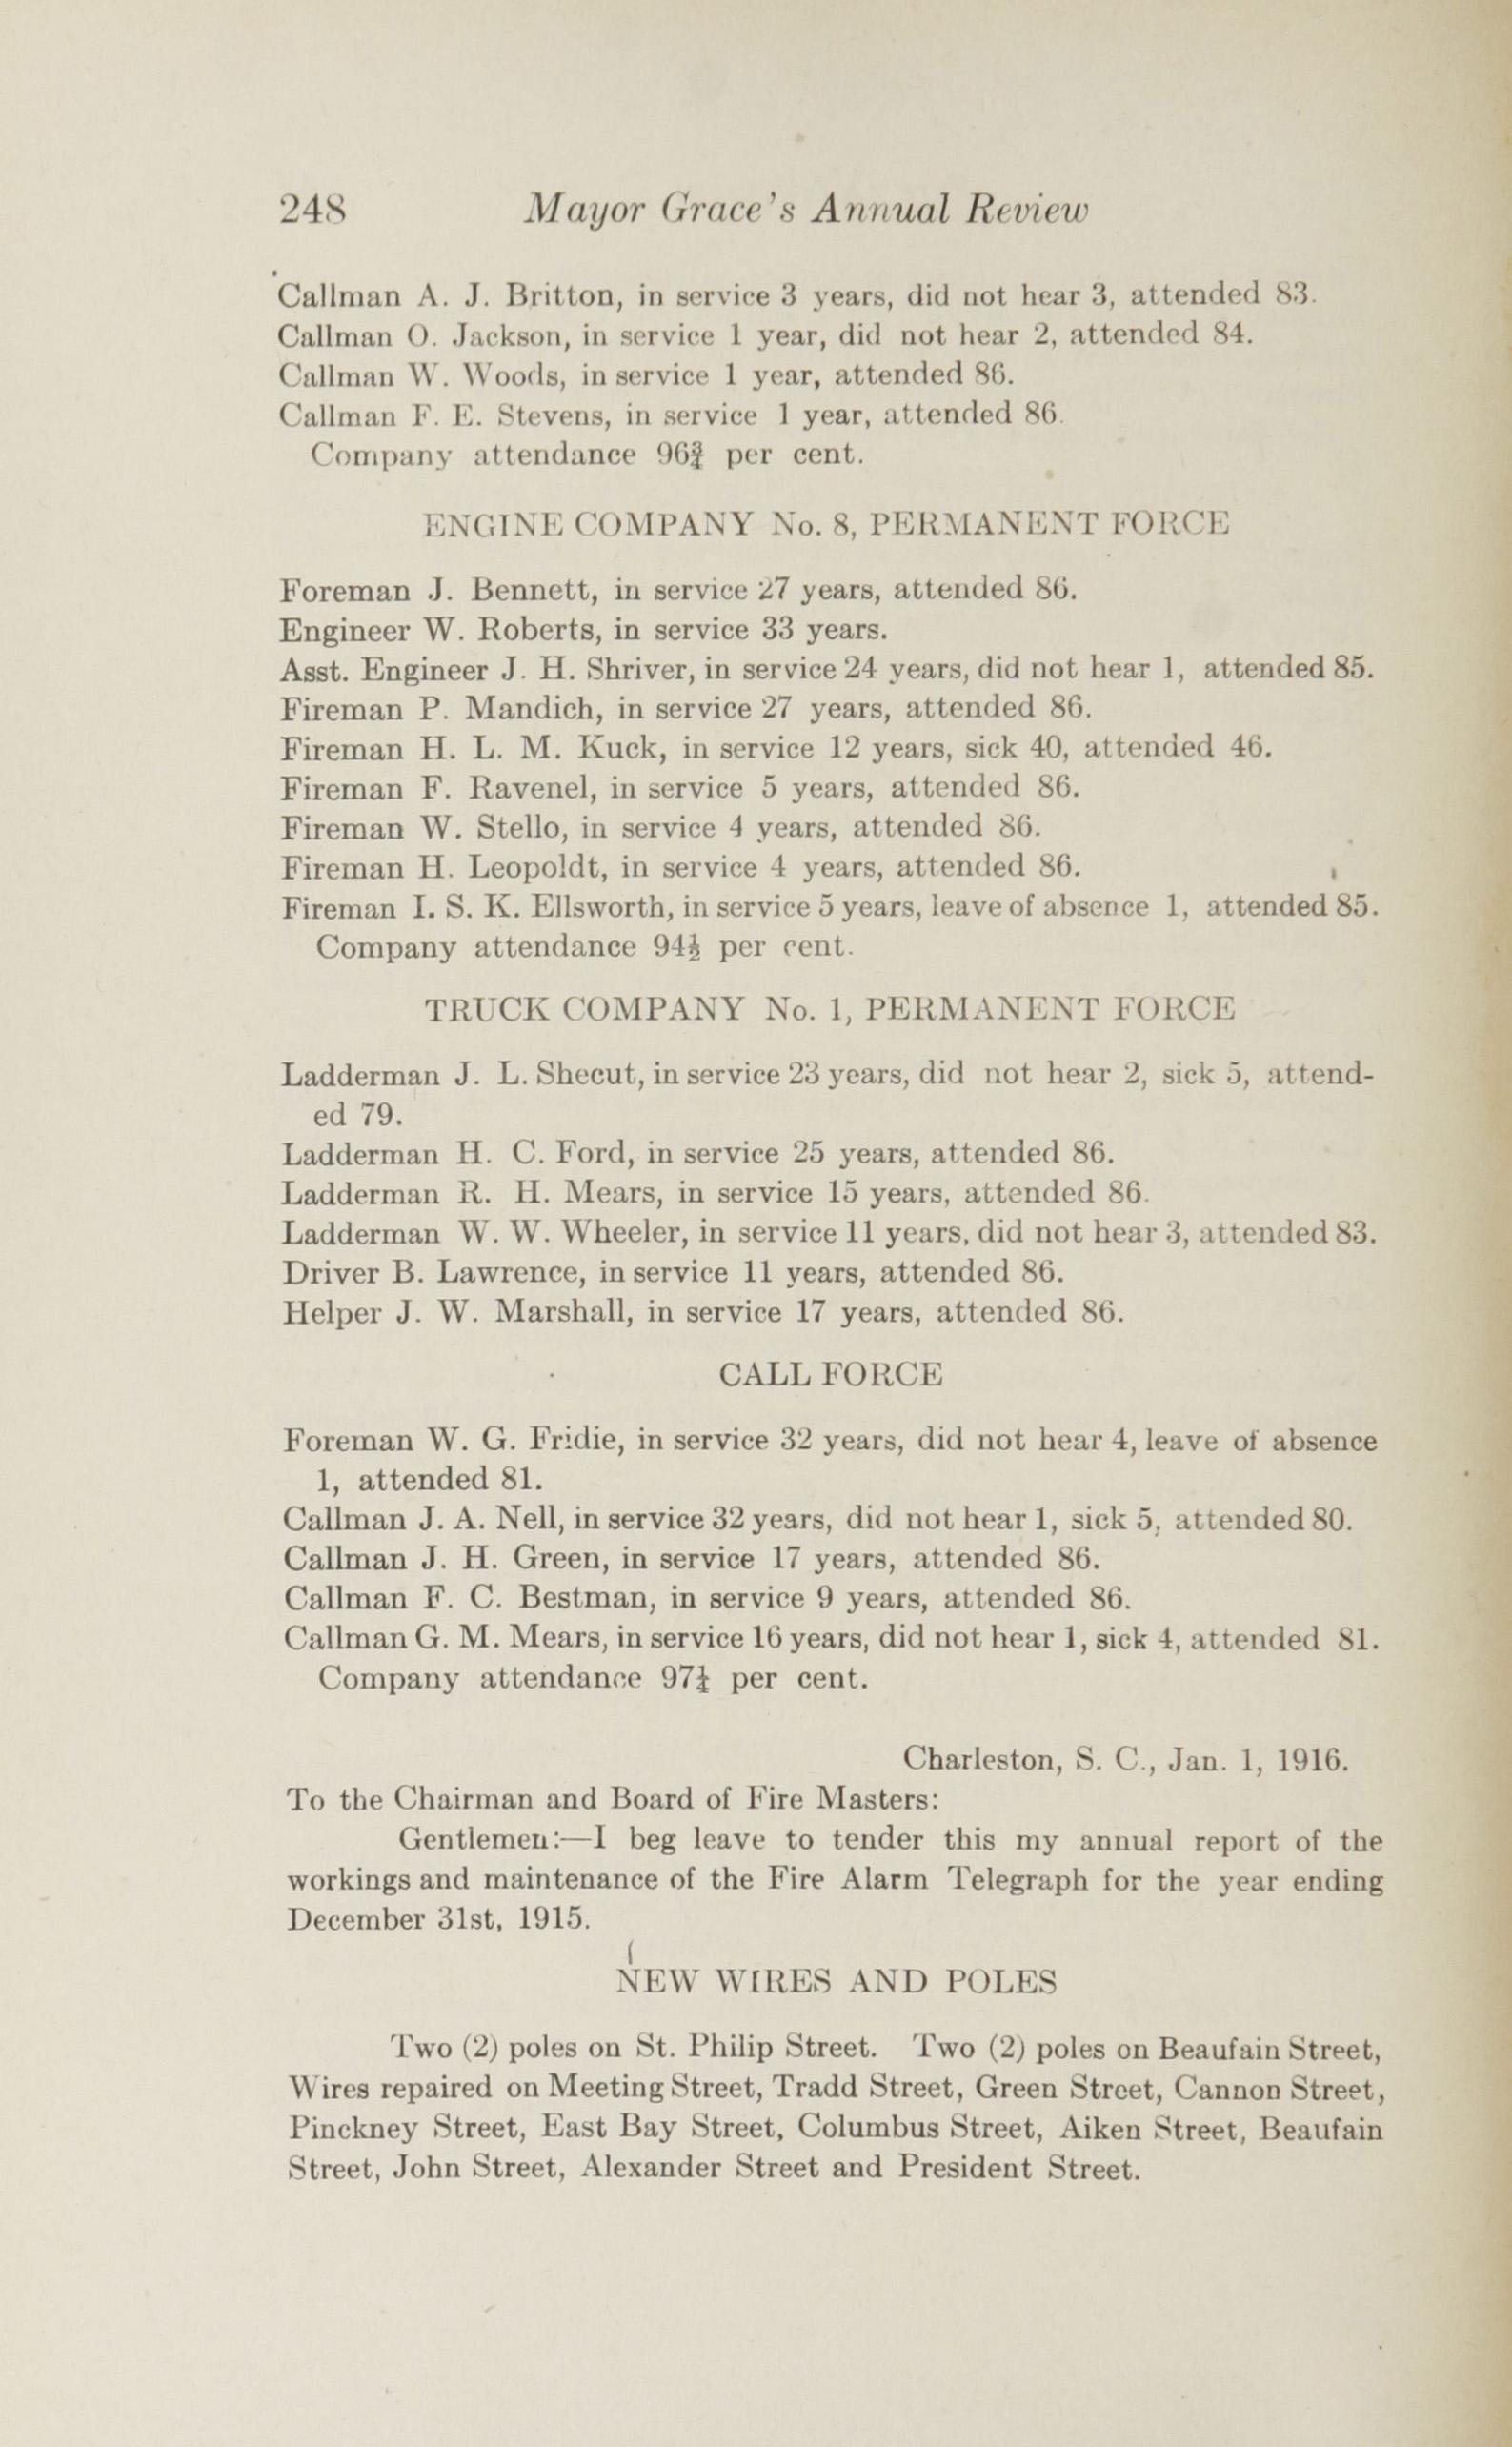 Charleston Yearbook, 1915, page 248